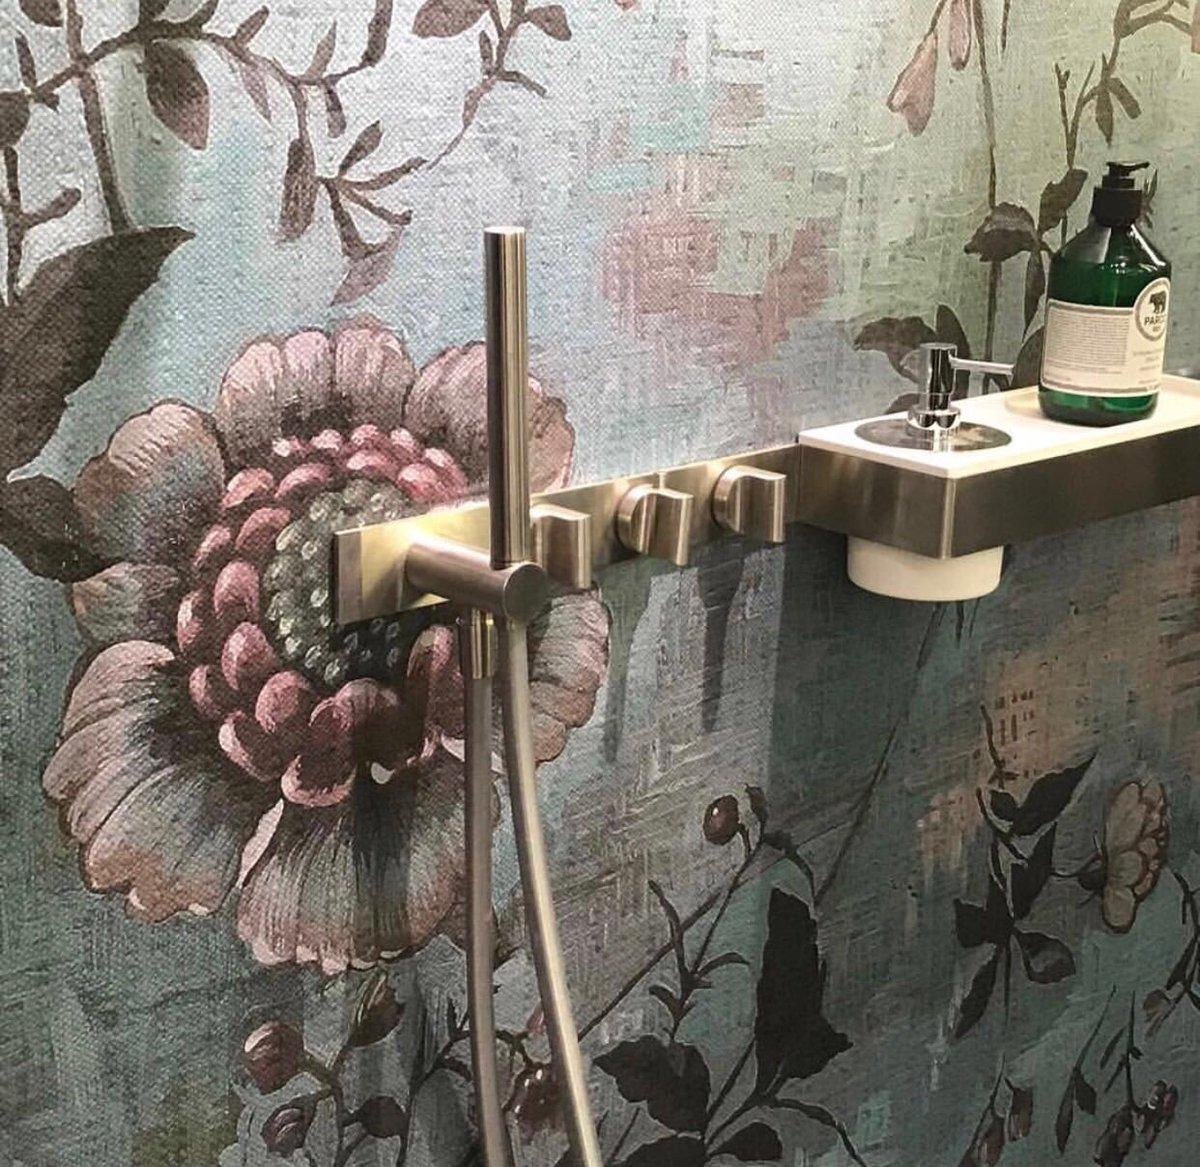 Wall&amp;deco for the shower. Wet System: Dame Voilee. Designer: Eva Germani for @Wall&amp;deco. #wallart #milanogram2018 #letusbeyourresource #wallanddeco #papierpeint #wallpaper #tapete #papelpintado #wallcovering #design #walldecoration #instawall #decor #decorate #interiordesign<br>http://pic.twitter.com/ZXjwSP87zE